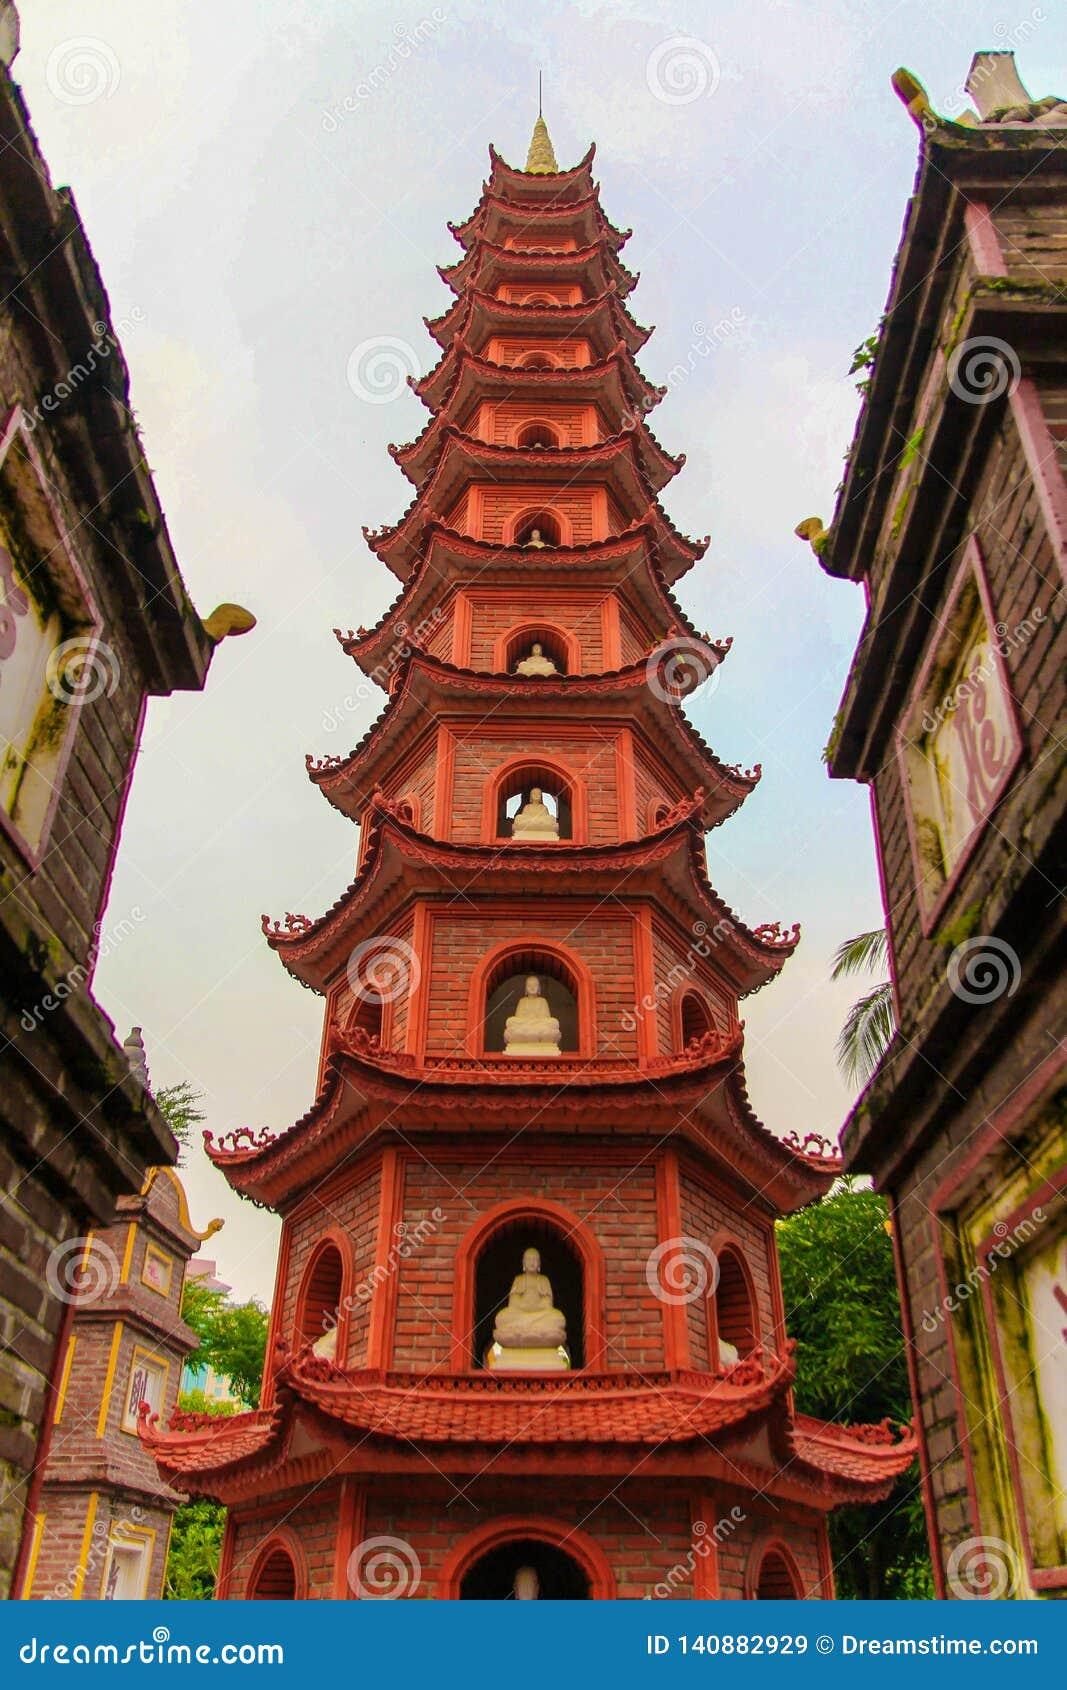 Tran Quoc Pagoda in Hanoi Vietnam